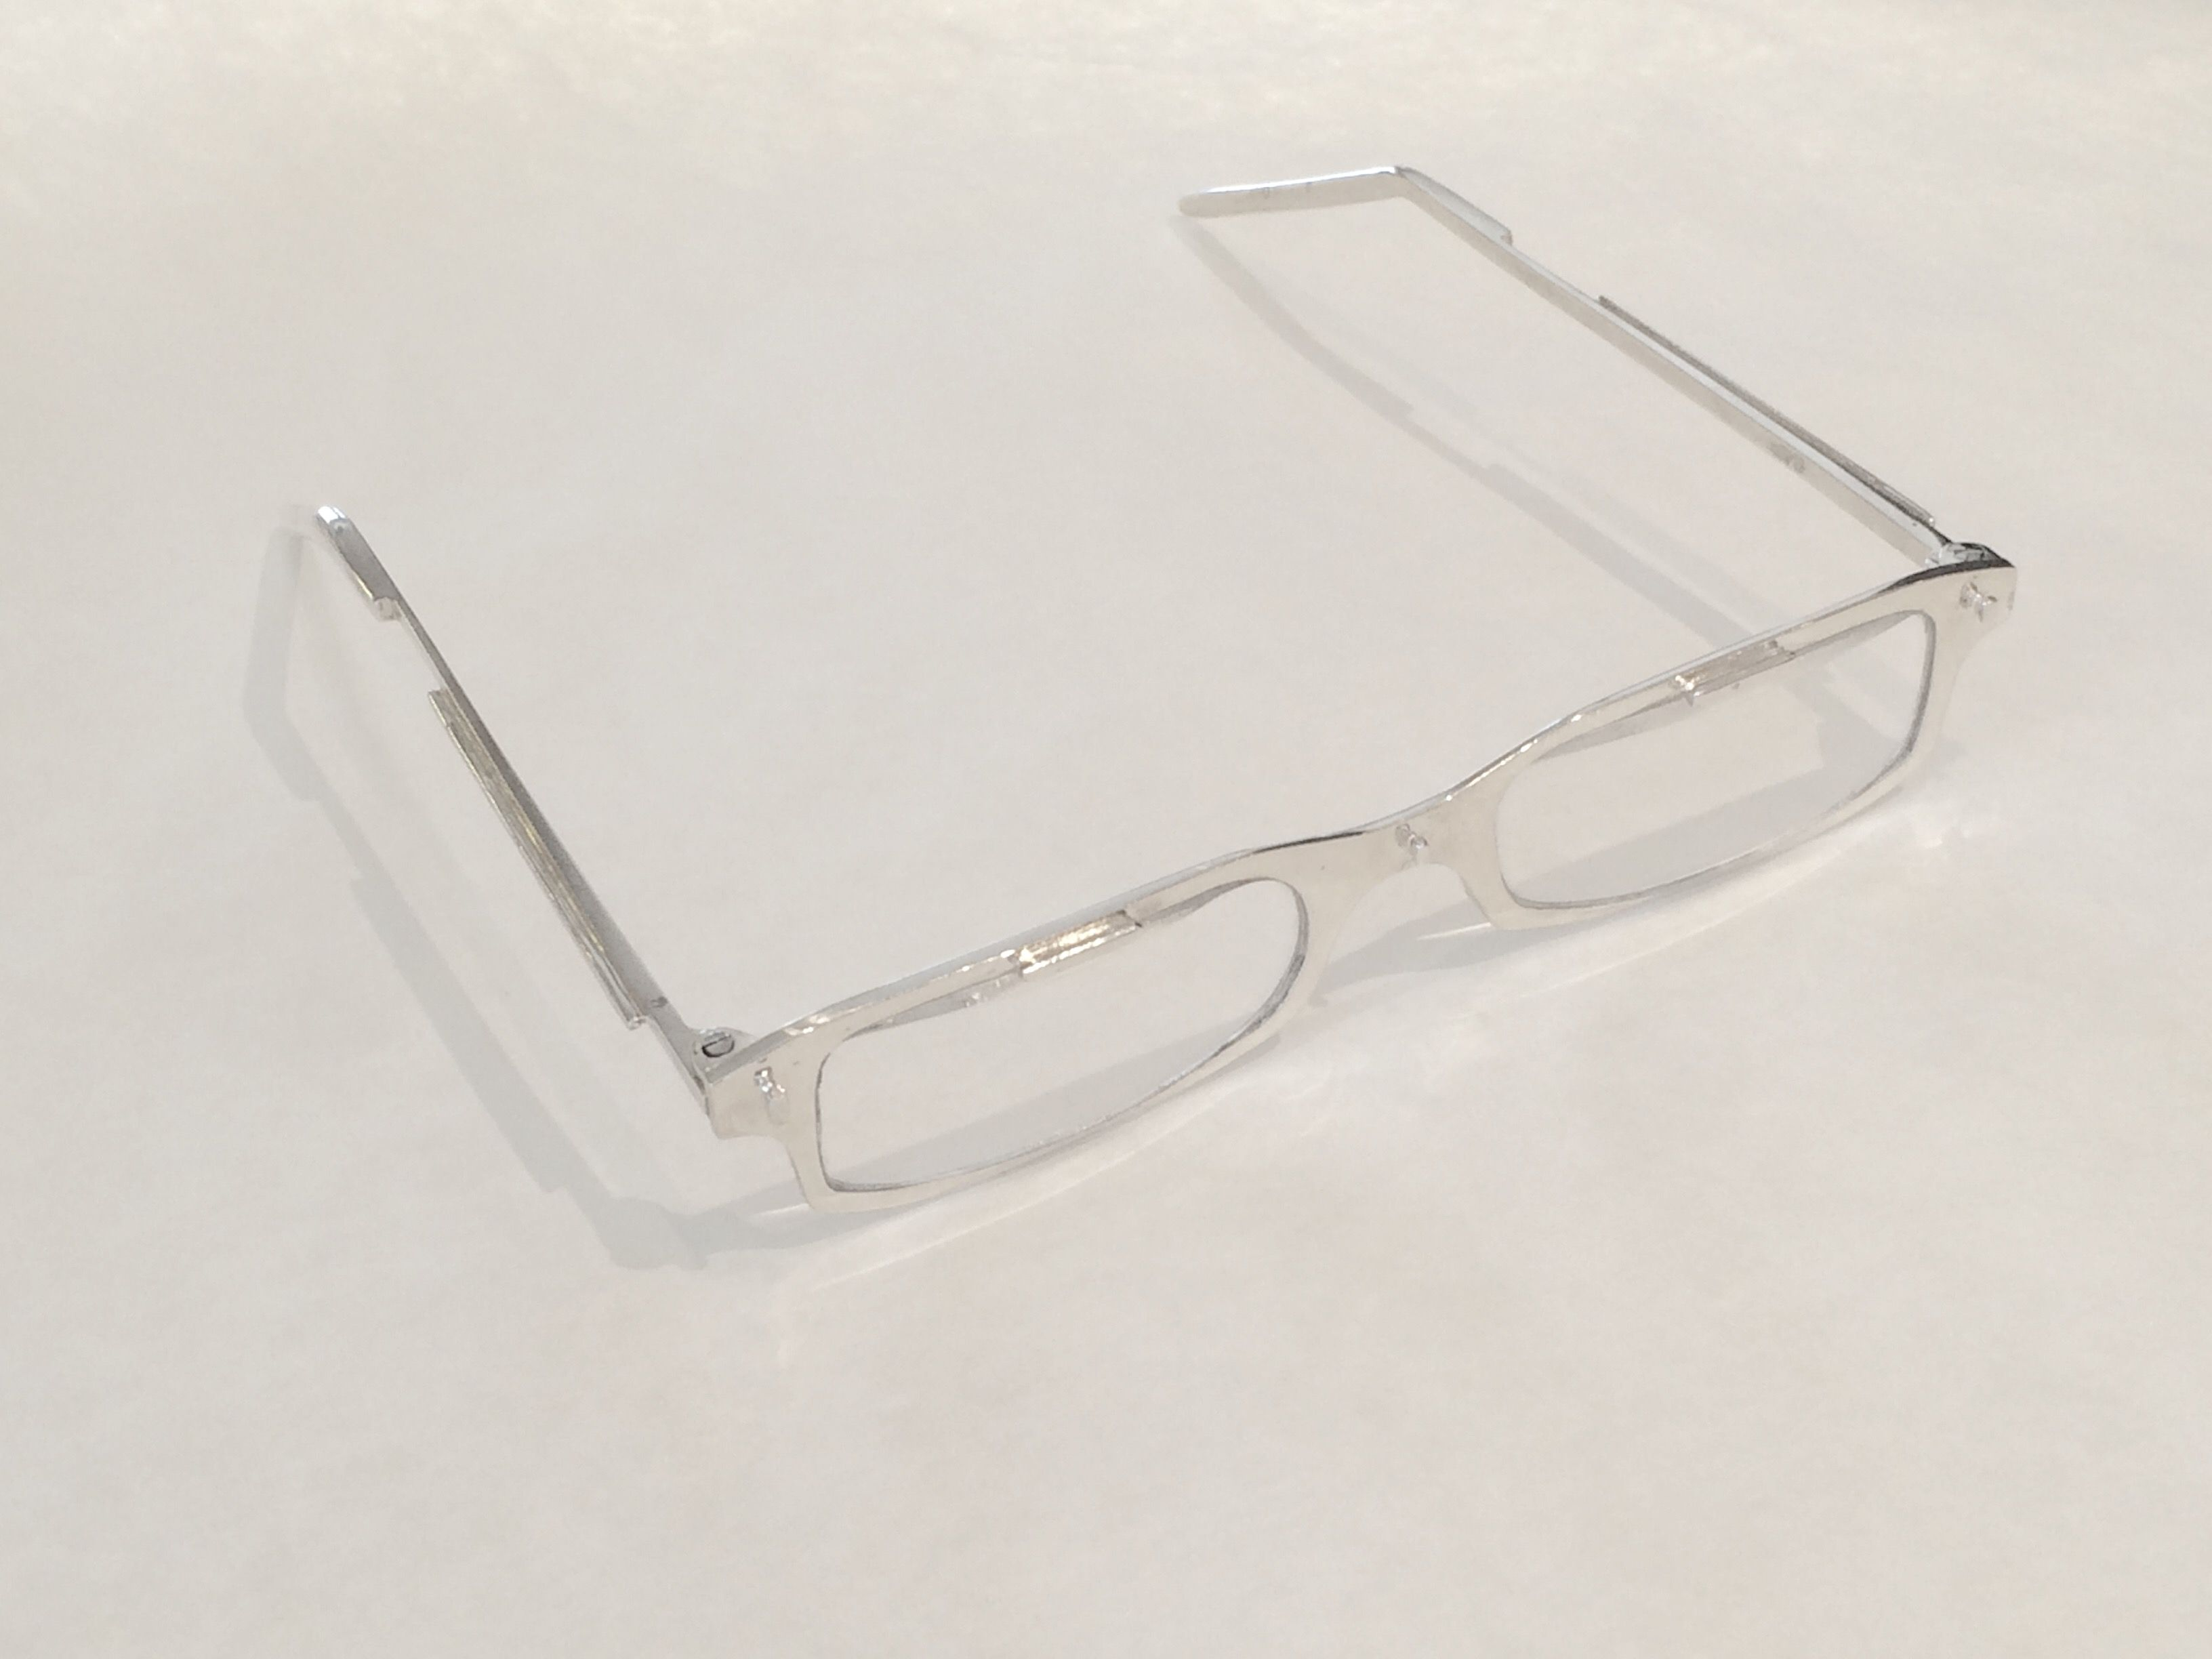 The final prototype of the custom eye glasses.